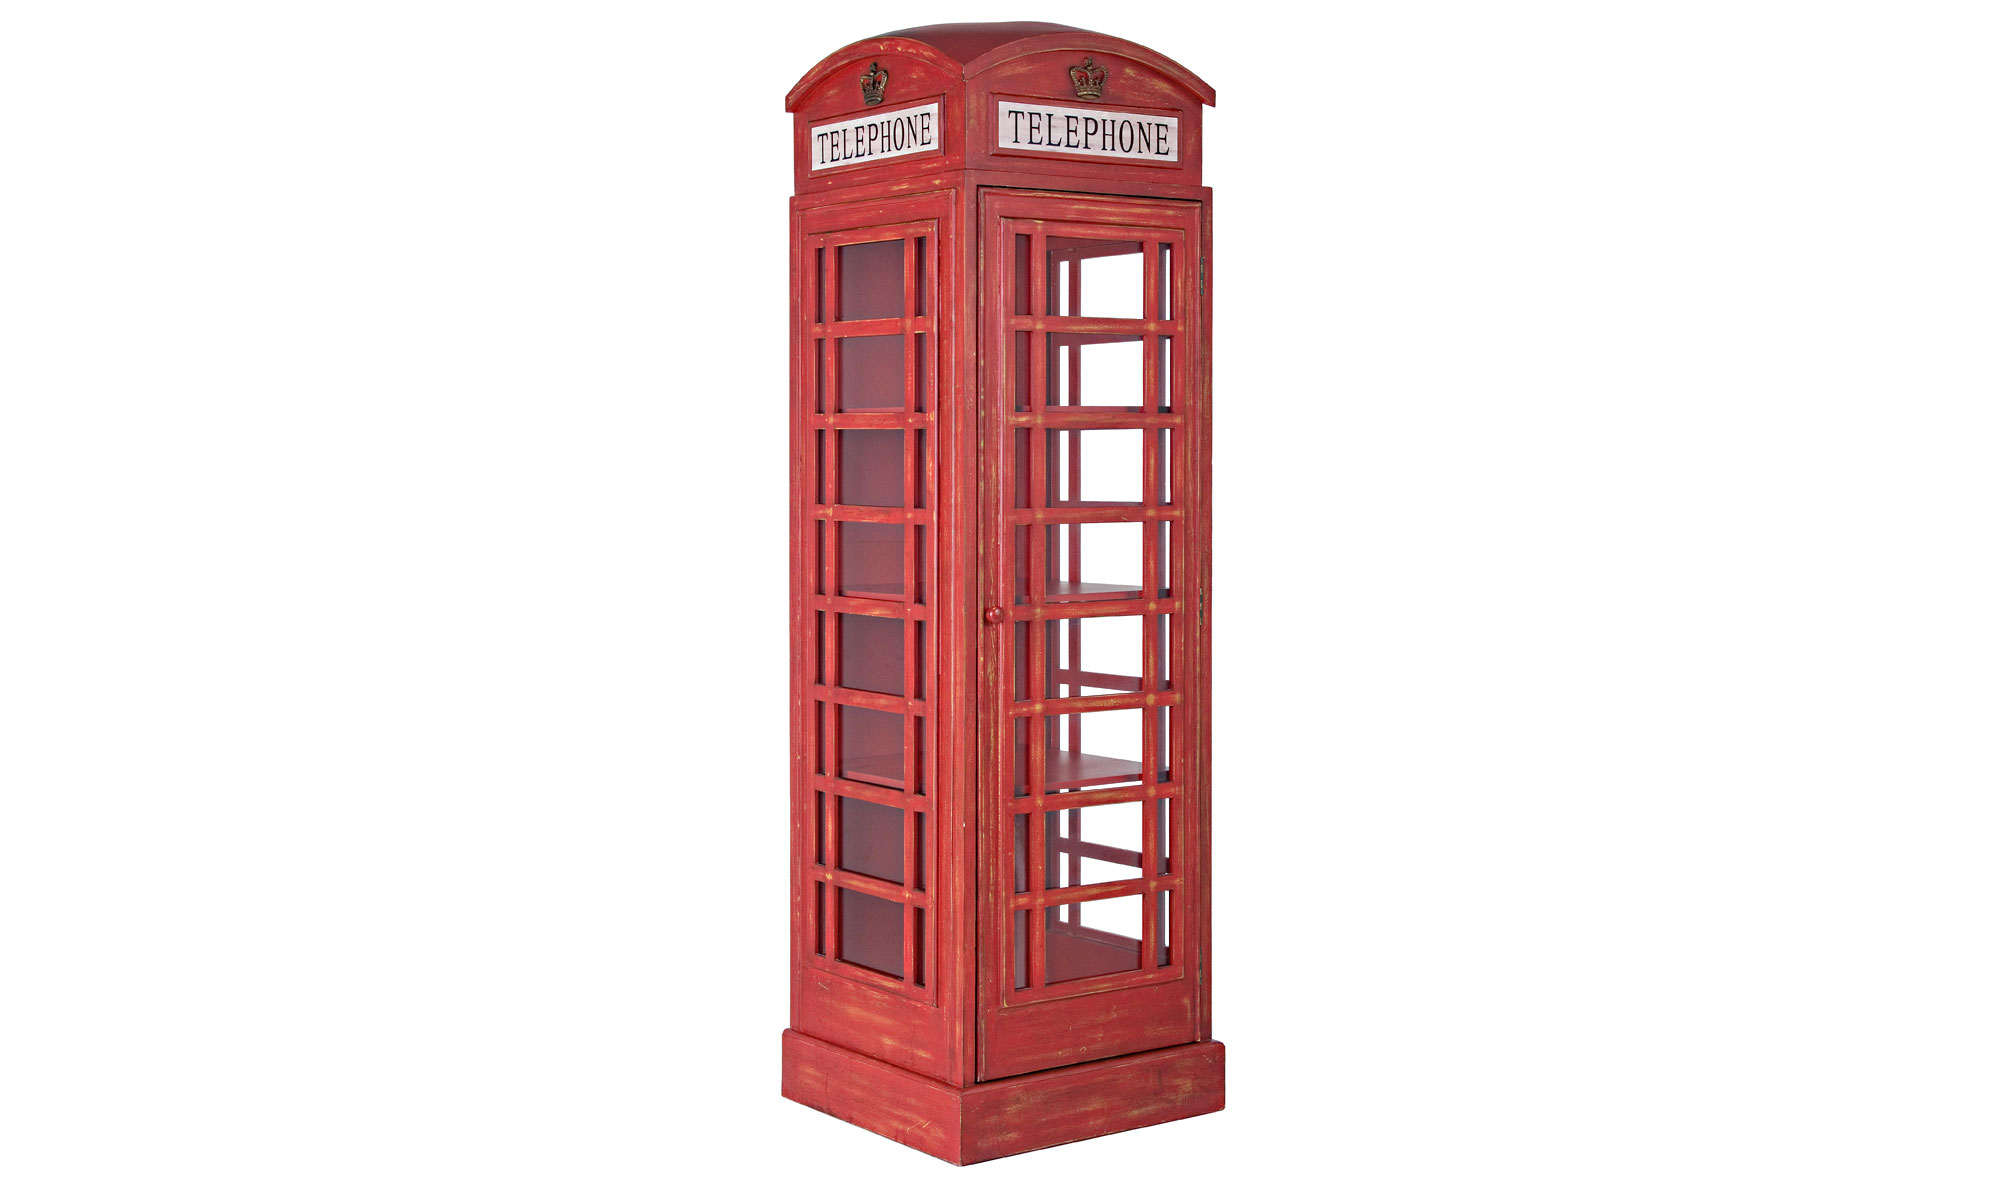 Cabina Telefonica : Vitrina grande cabina telefonica london no disponible en